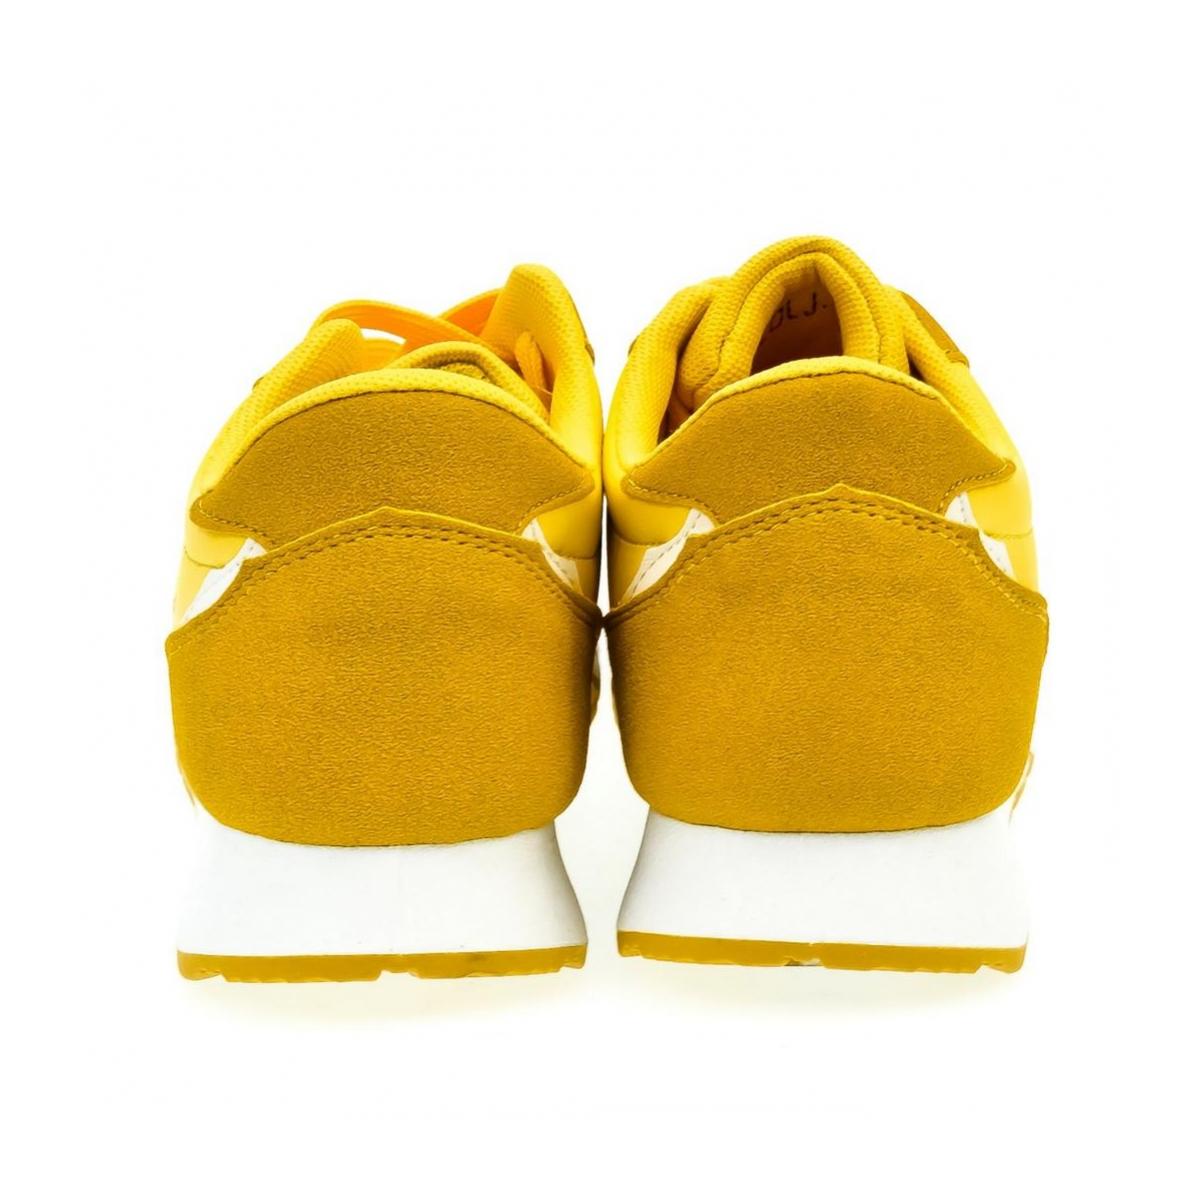 4be8b3c181ff1 Dámske žlté tenisky MARI - 3